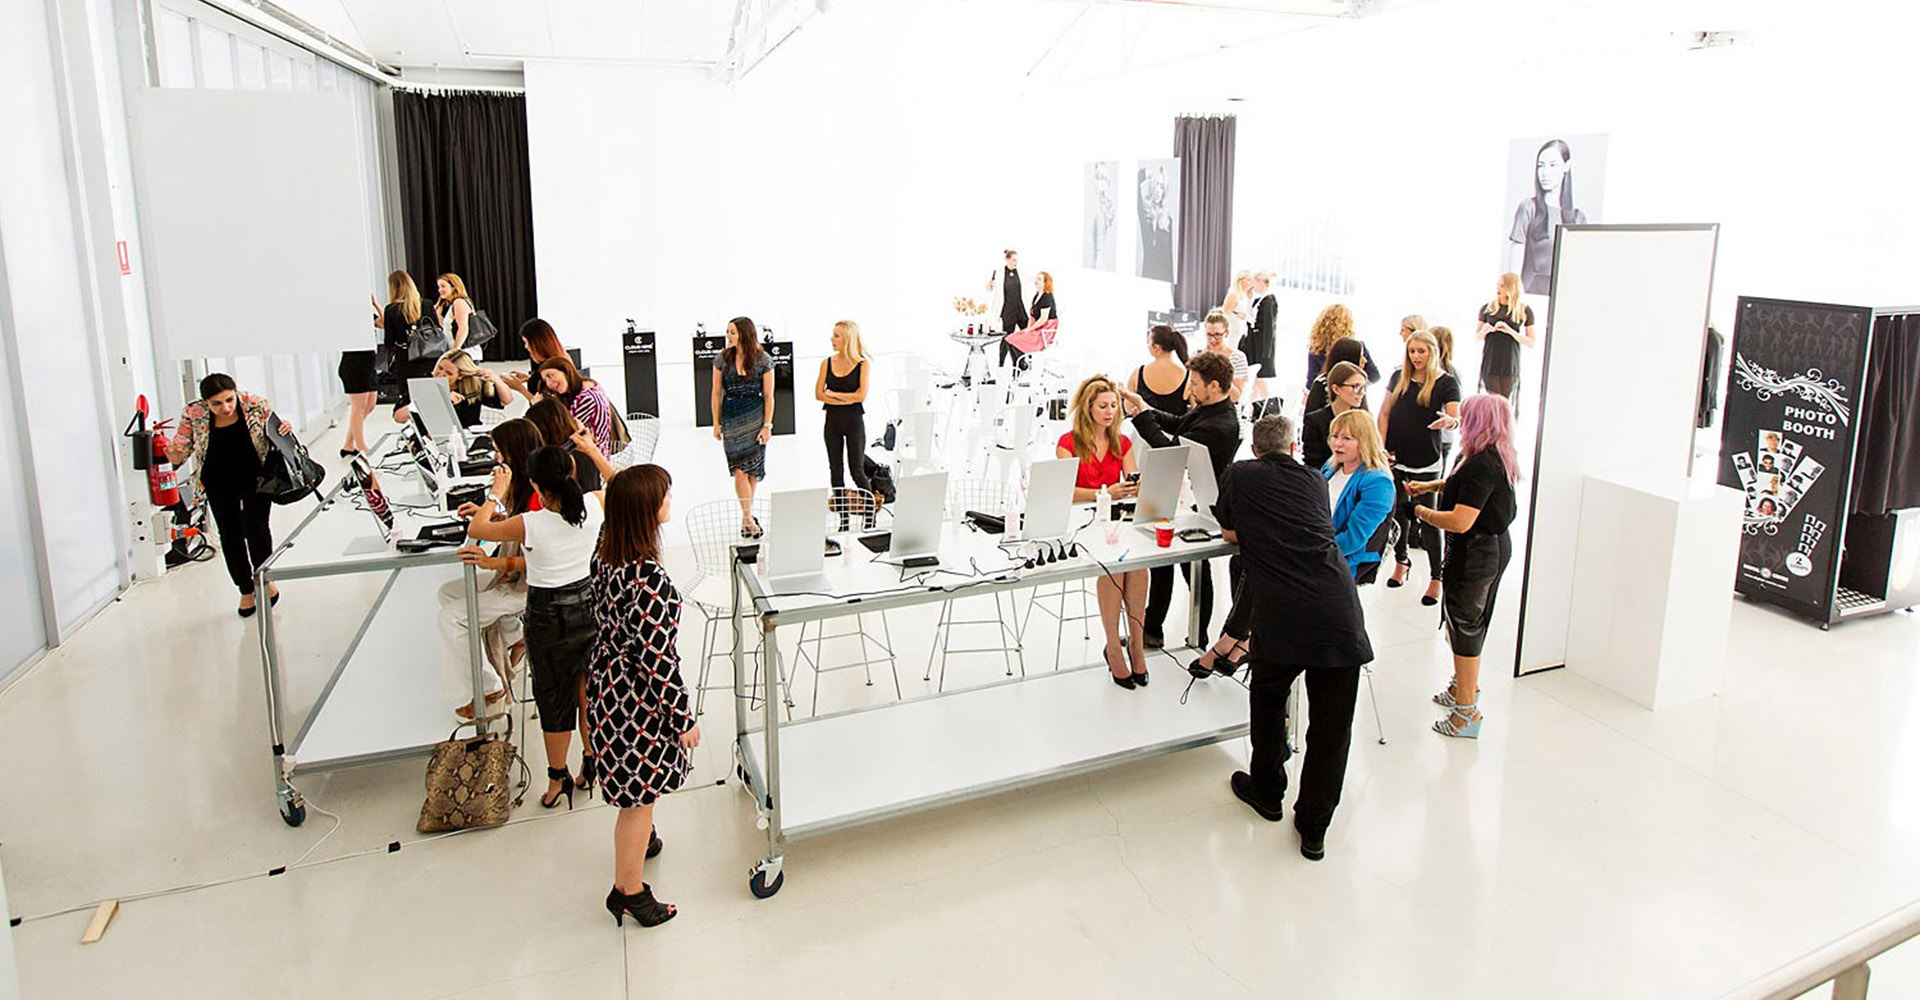 pix_on_location_studio_fashion_events_02_50